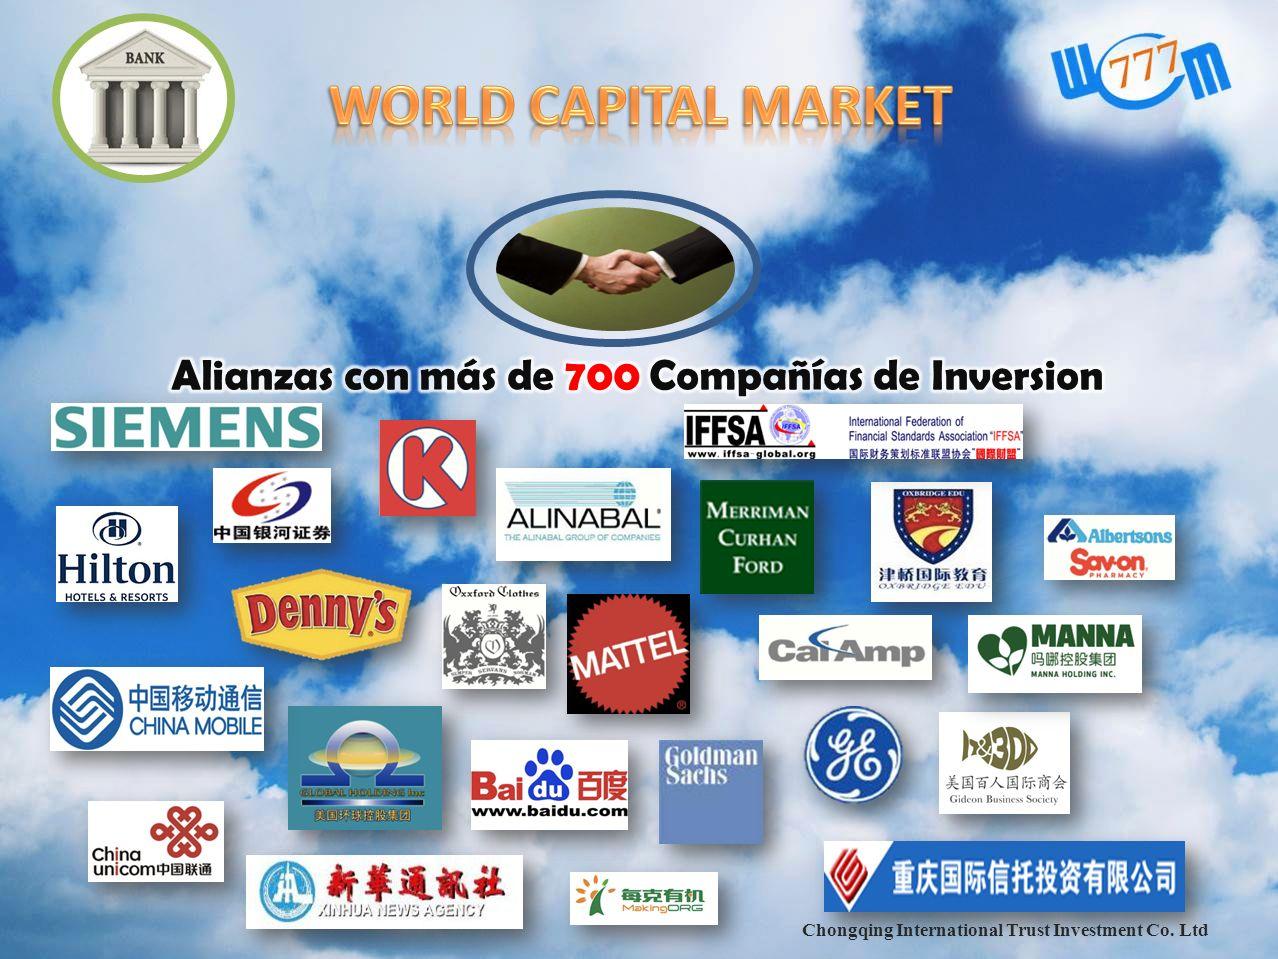 Chongqing International Trust Investment Co. Ltd